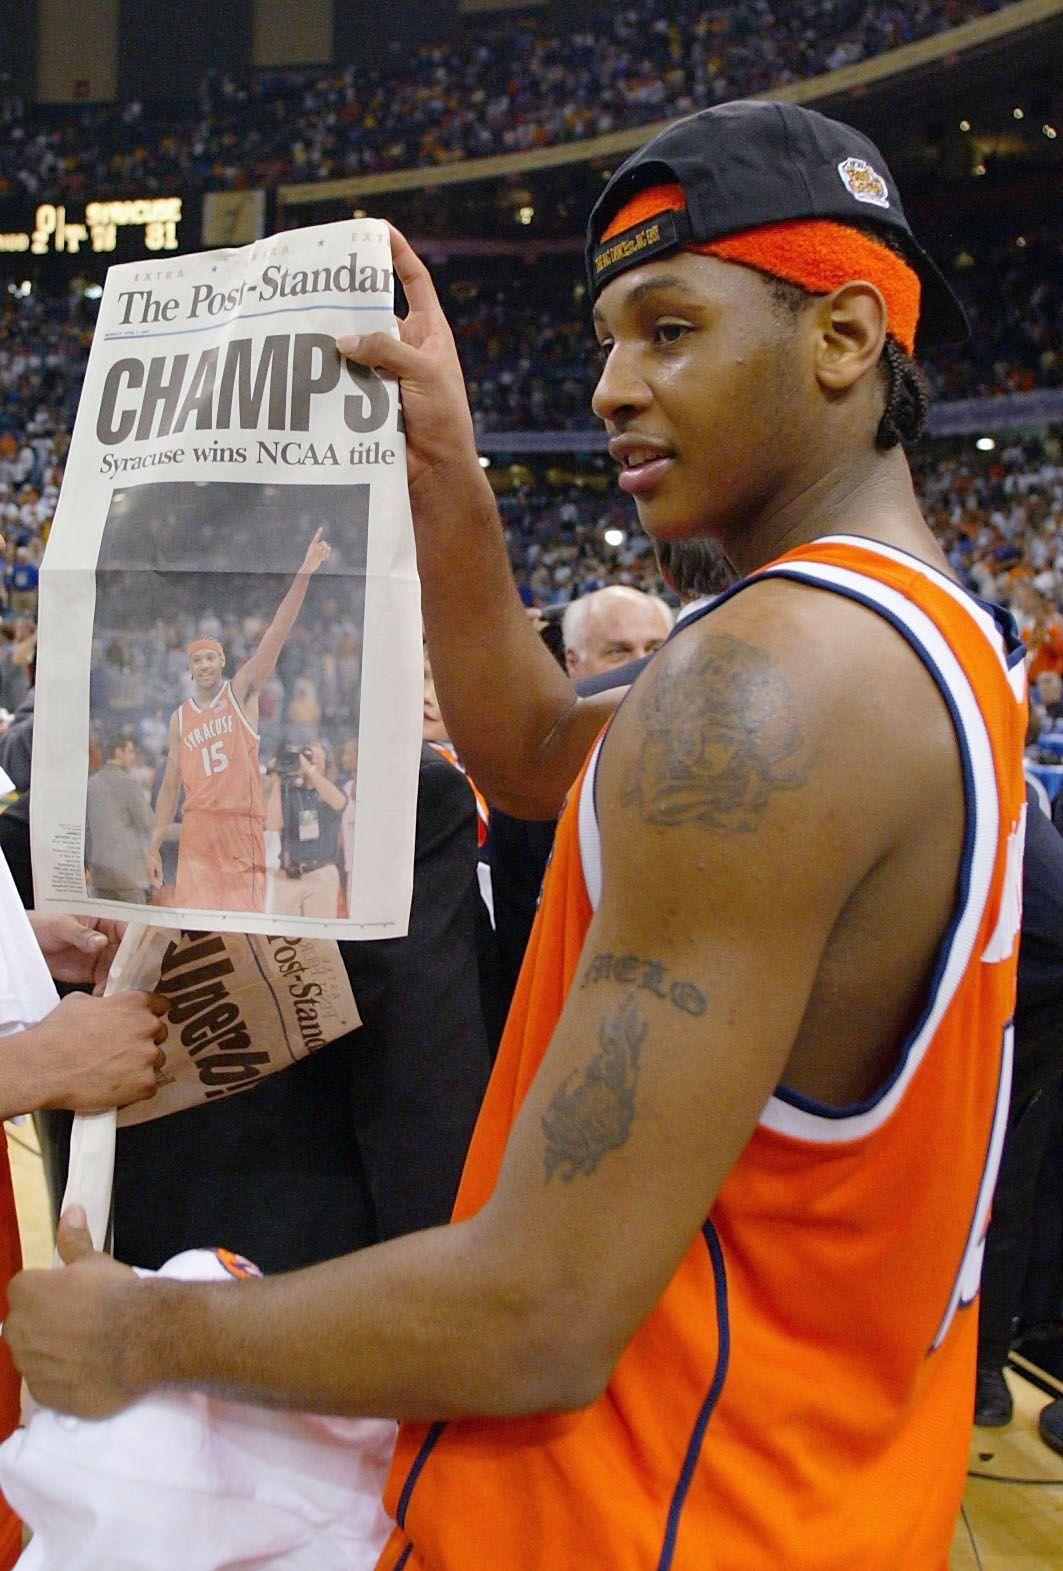 Melo winning the NCAA championship Syracuse! Syracuse